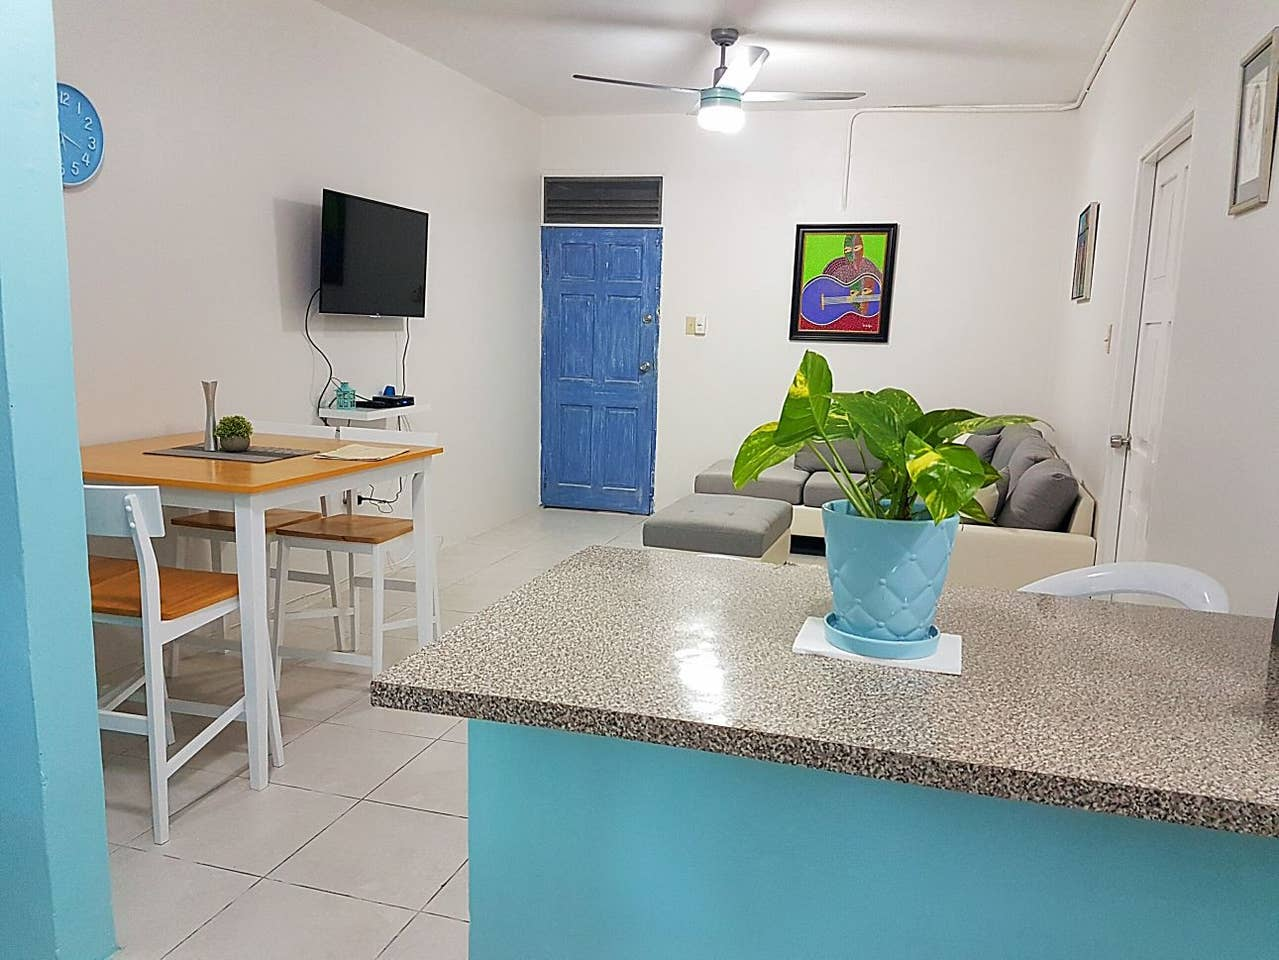 2 Bedroom Airbnb Jamaica